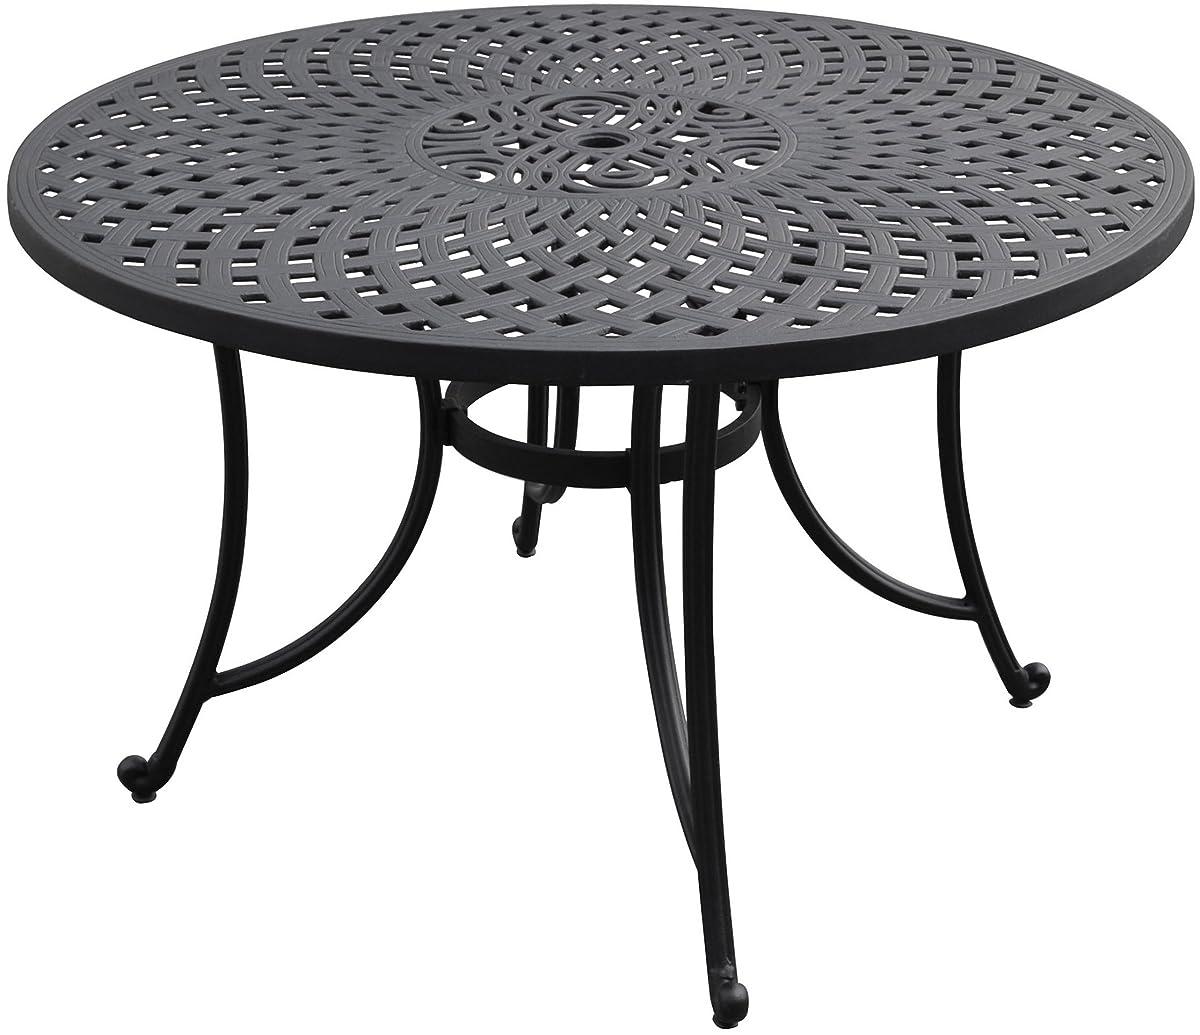 Crosley Furniture Sedona 48-inch Solid-Cast Aluminum Outdoor Dining Table - Black